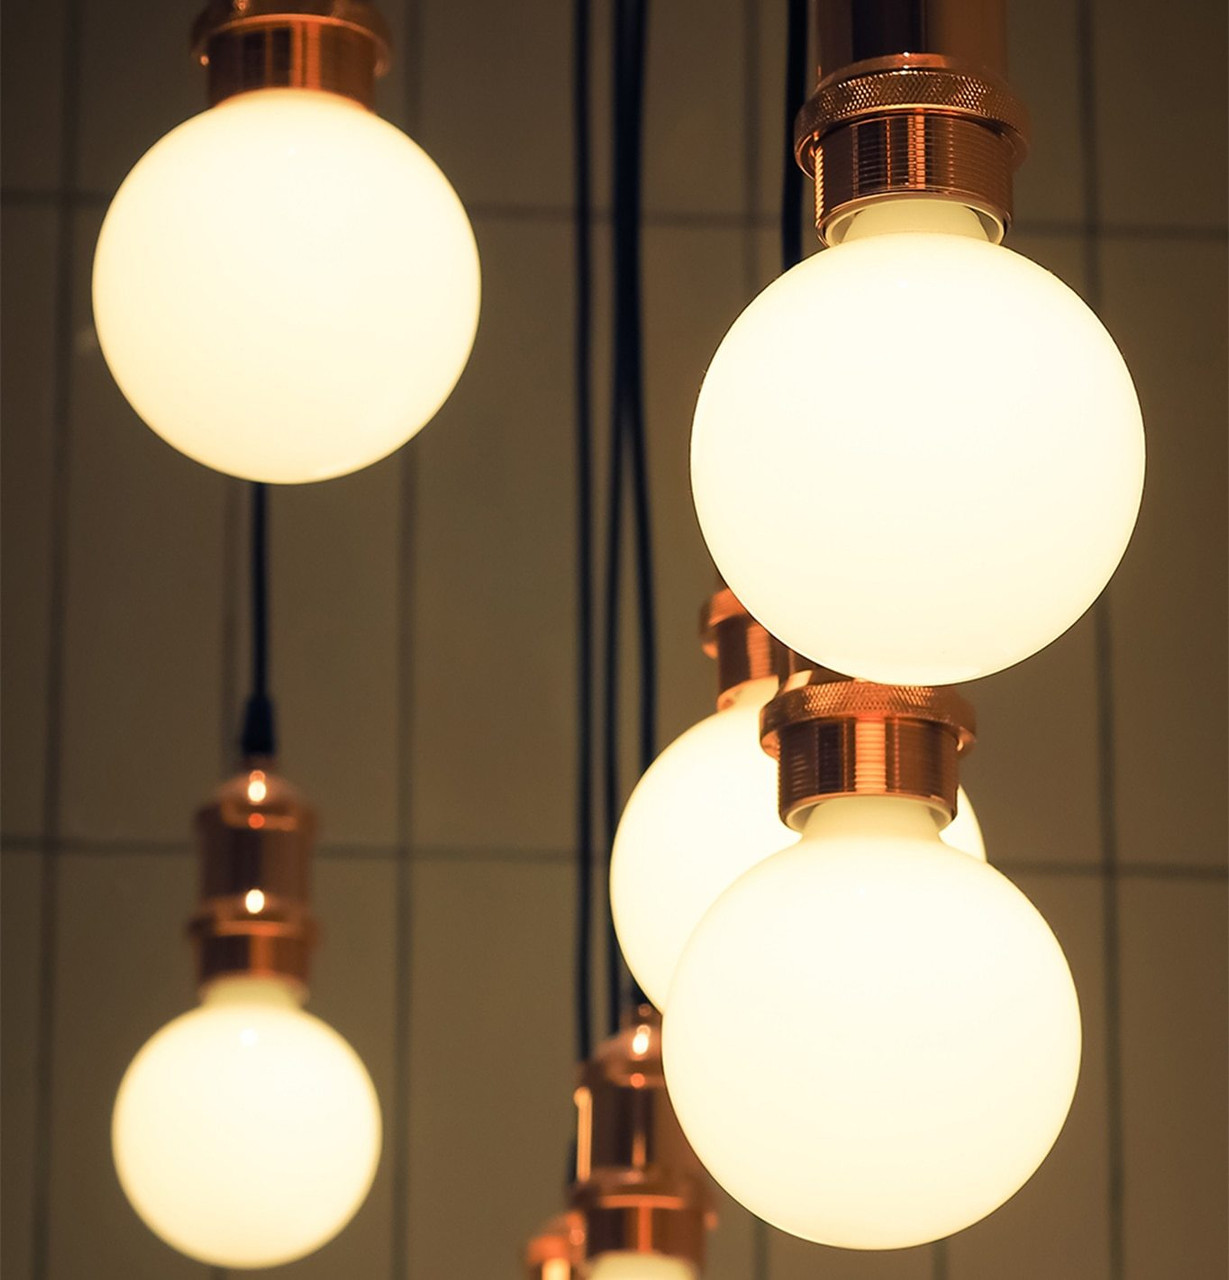 LED Globe ES-E27 Light Bulbs